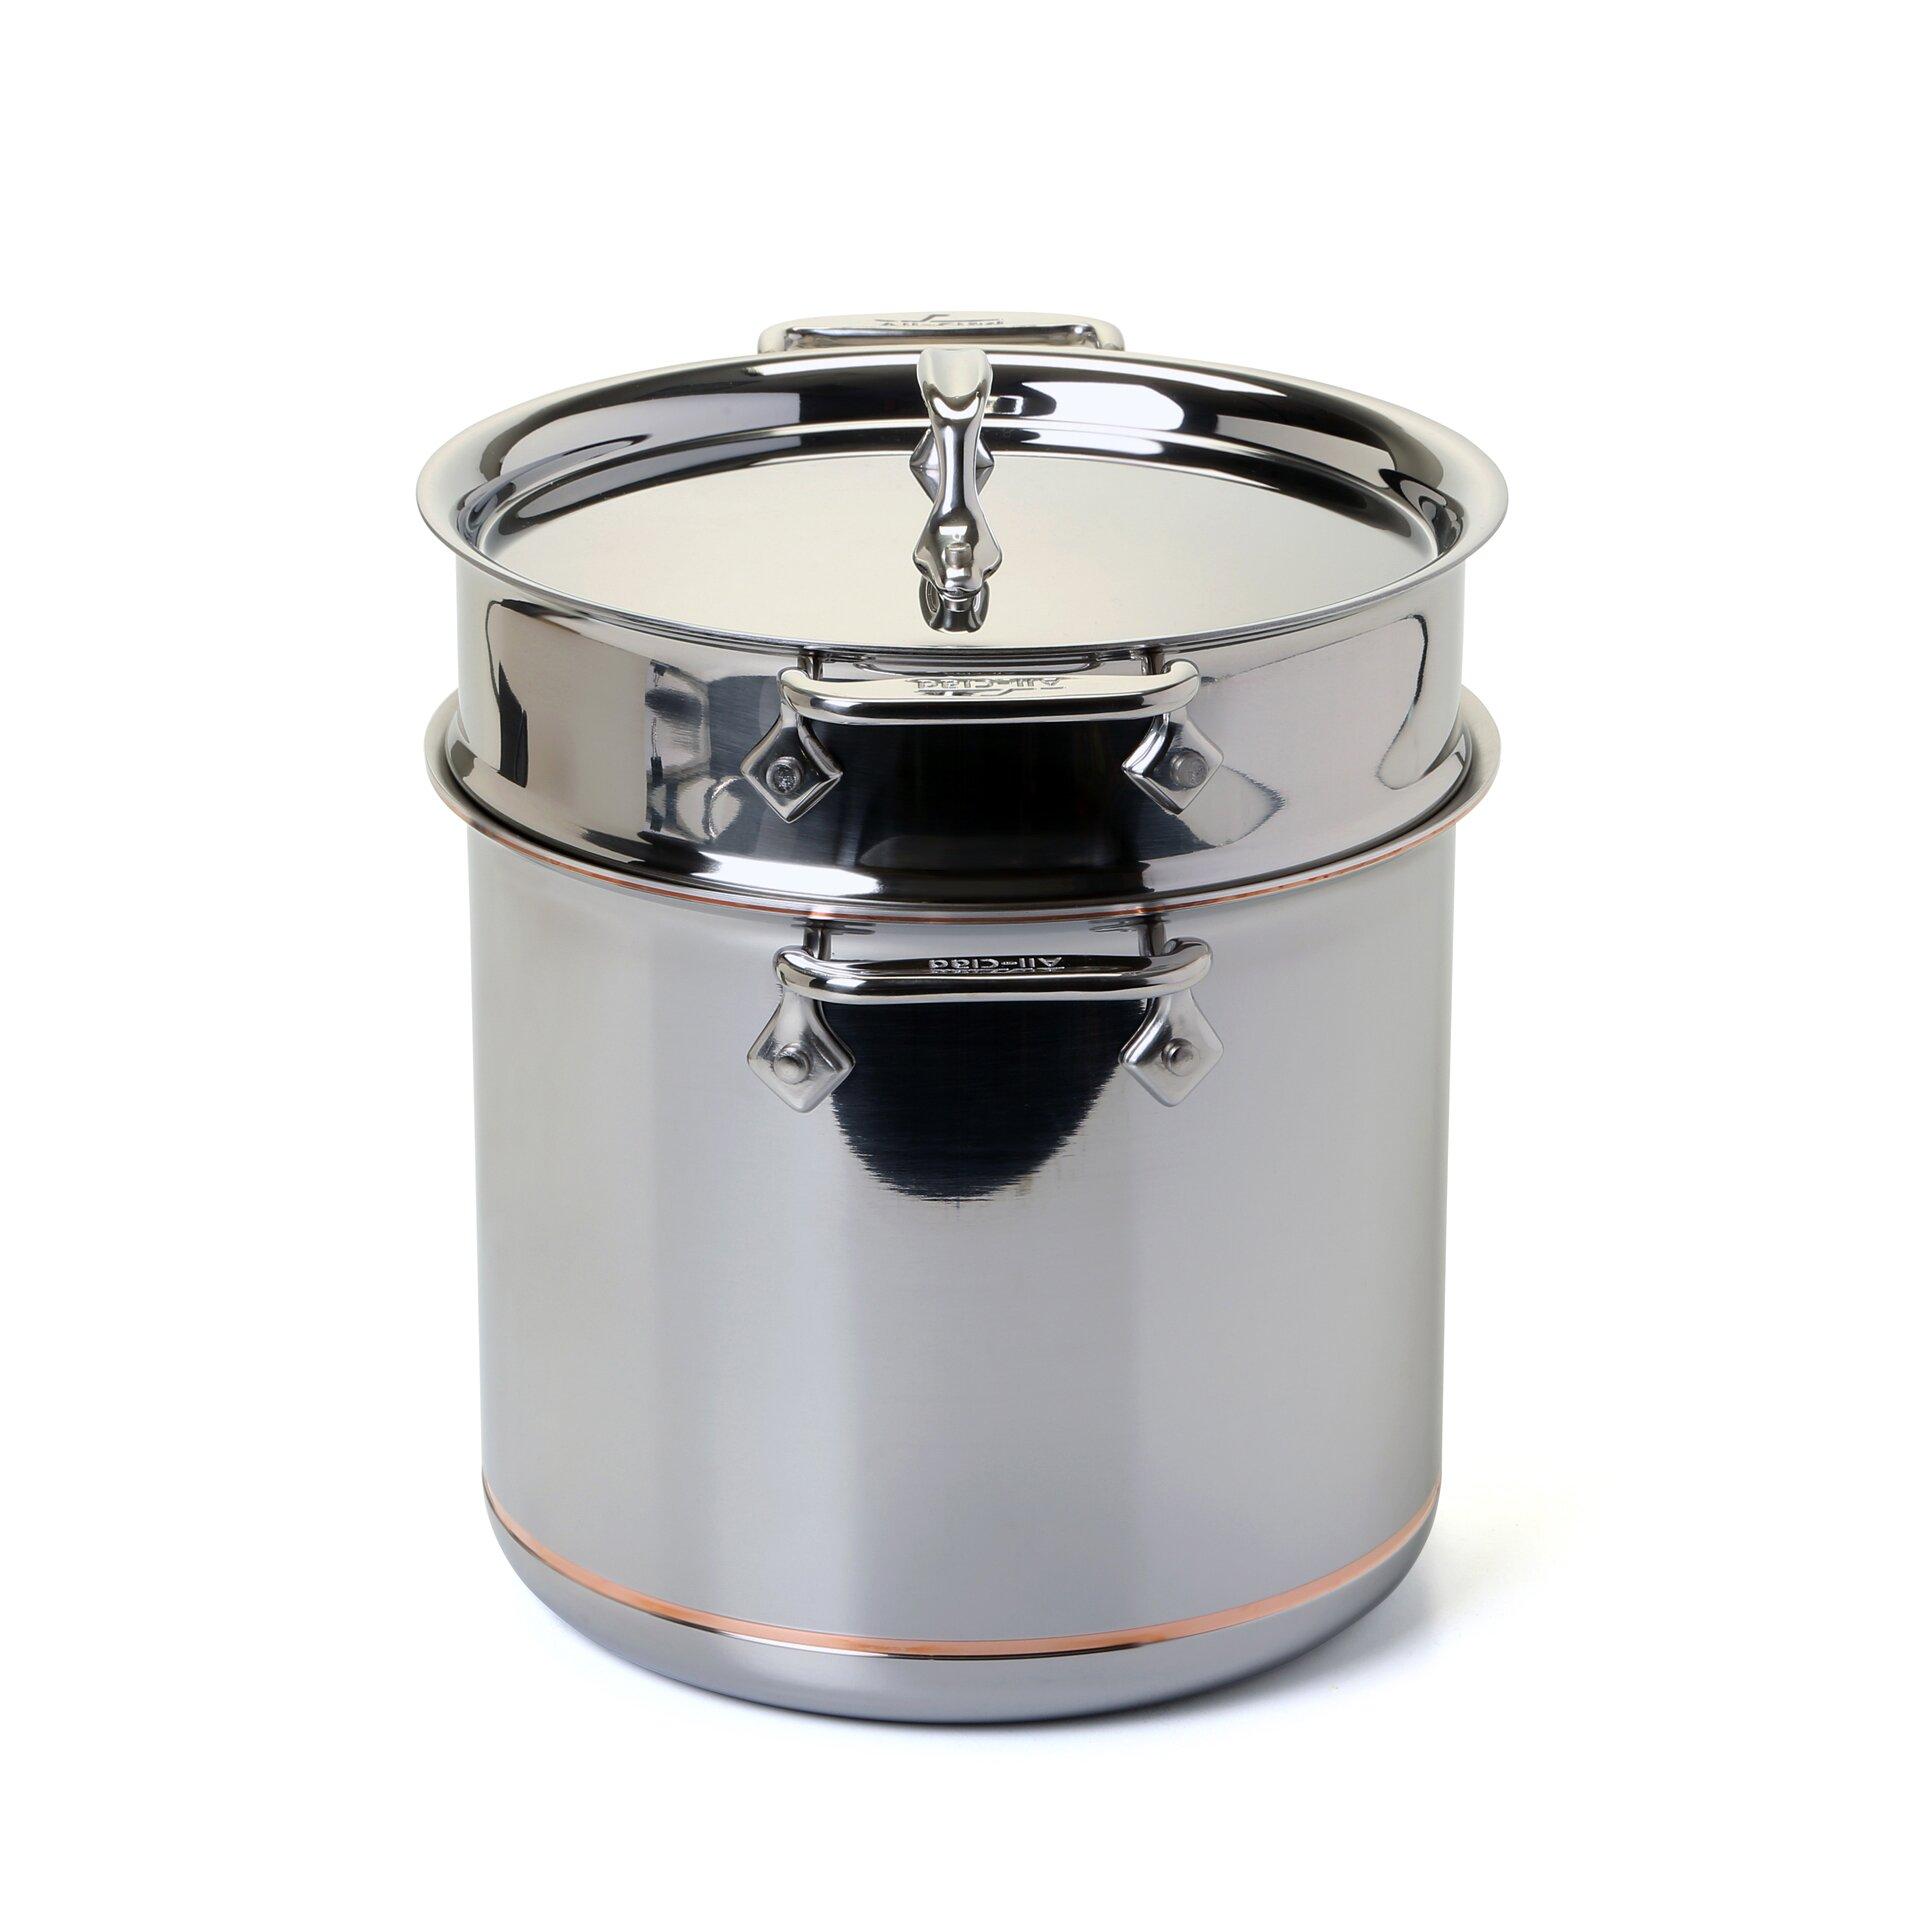 Printables One Drum How Many Quarts all clad copper core 7 qt multi pot reviews wayfair pot